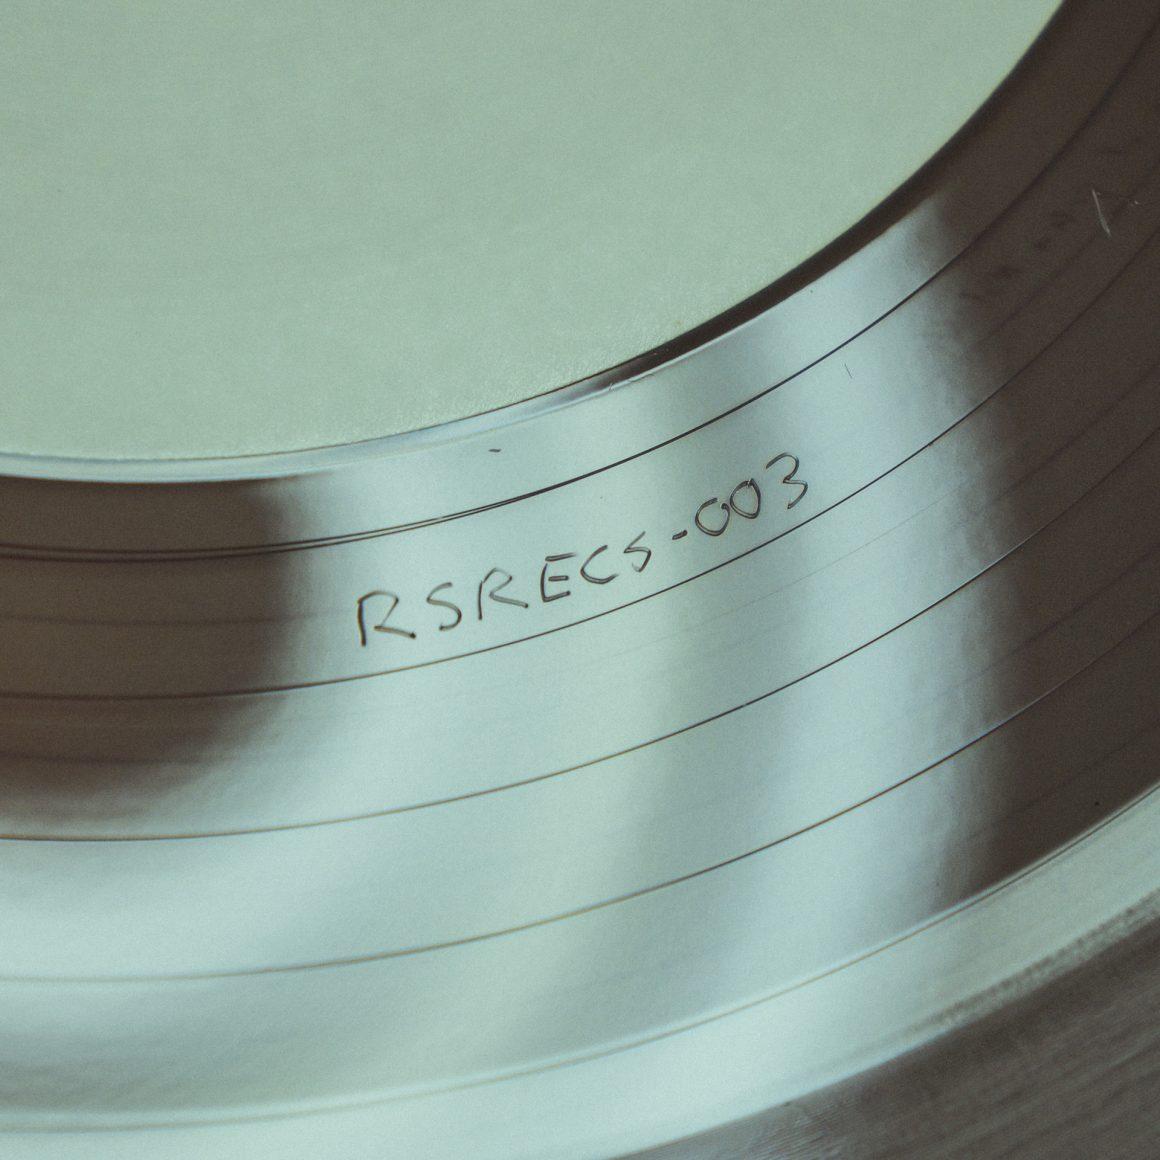 Rucksack Records